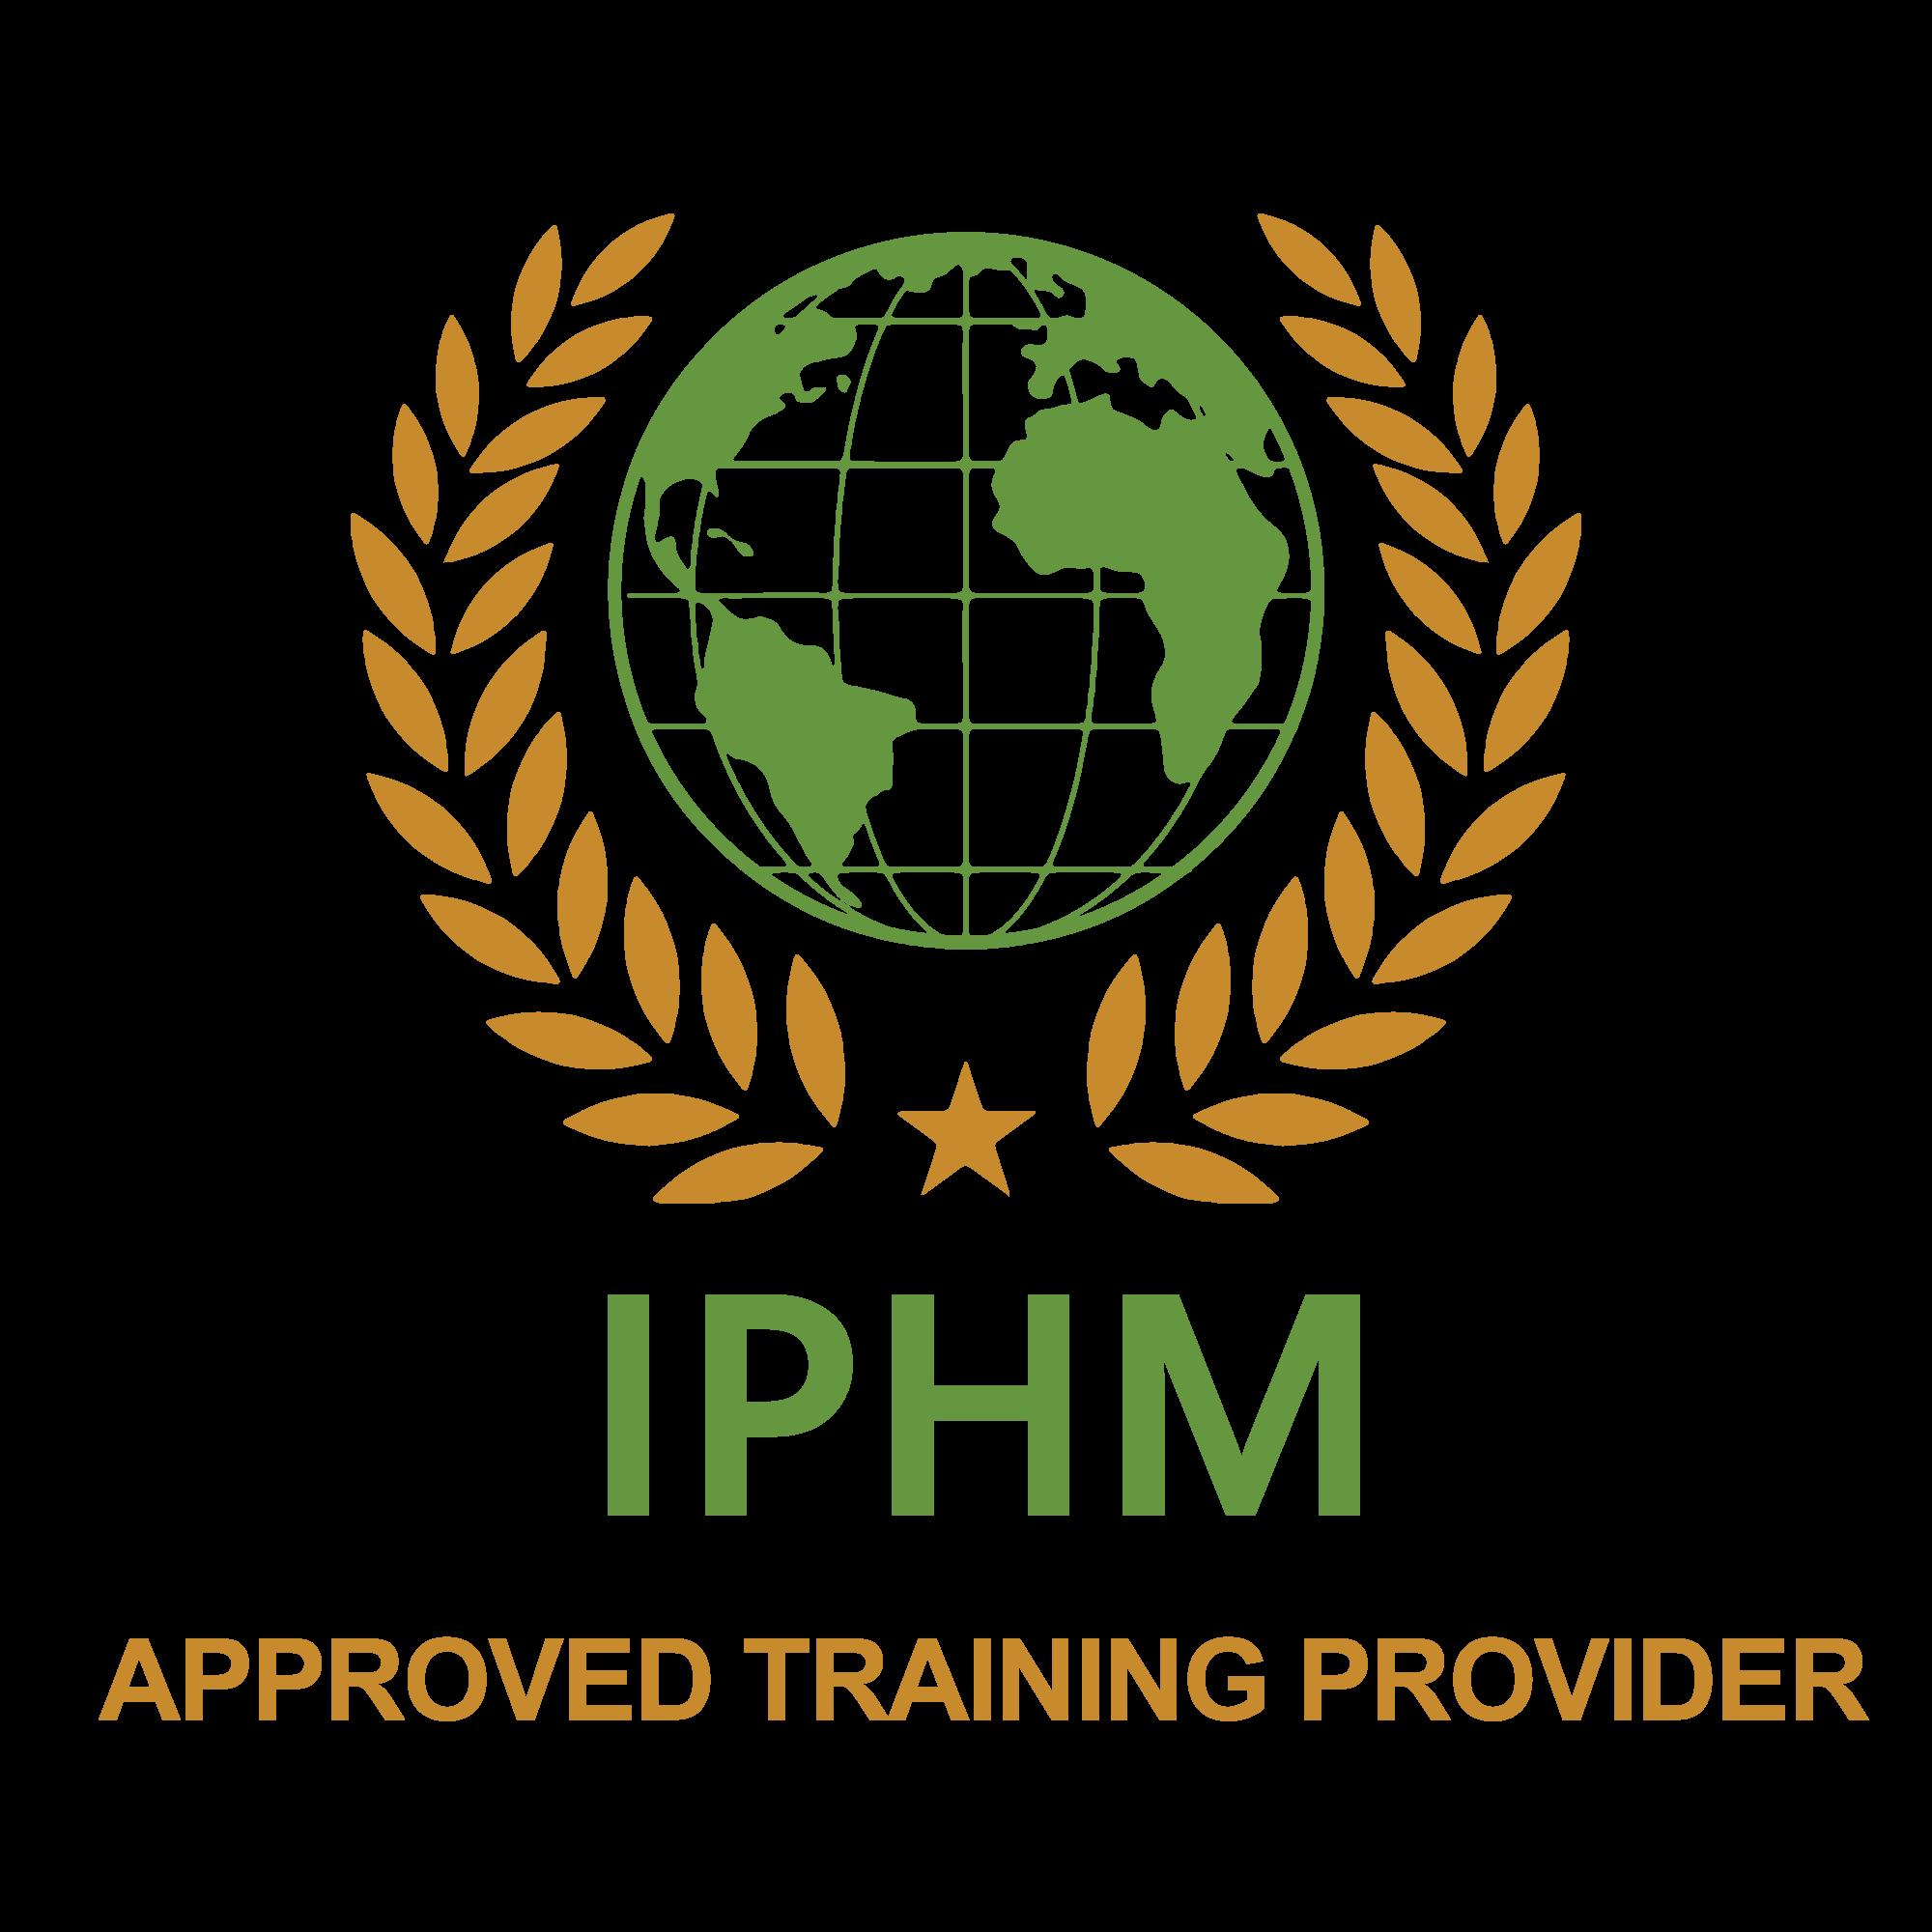 Orli - IPHM Training Provider